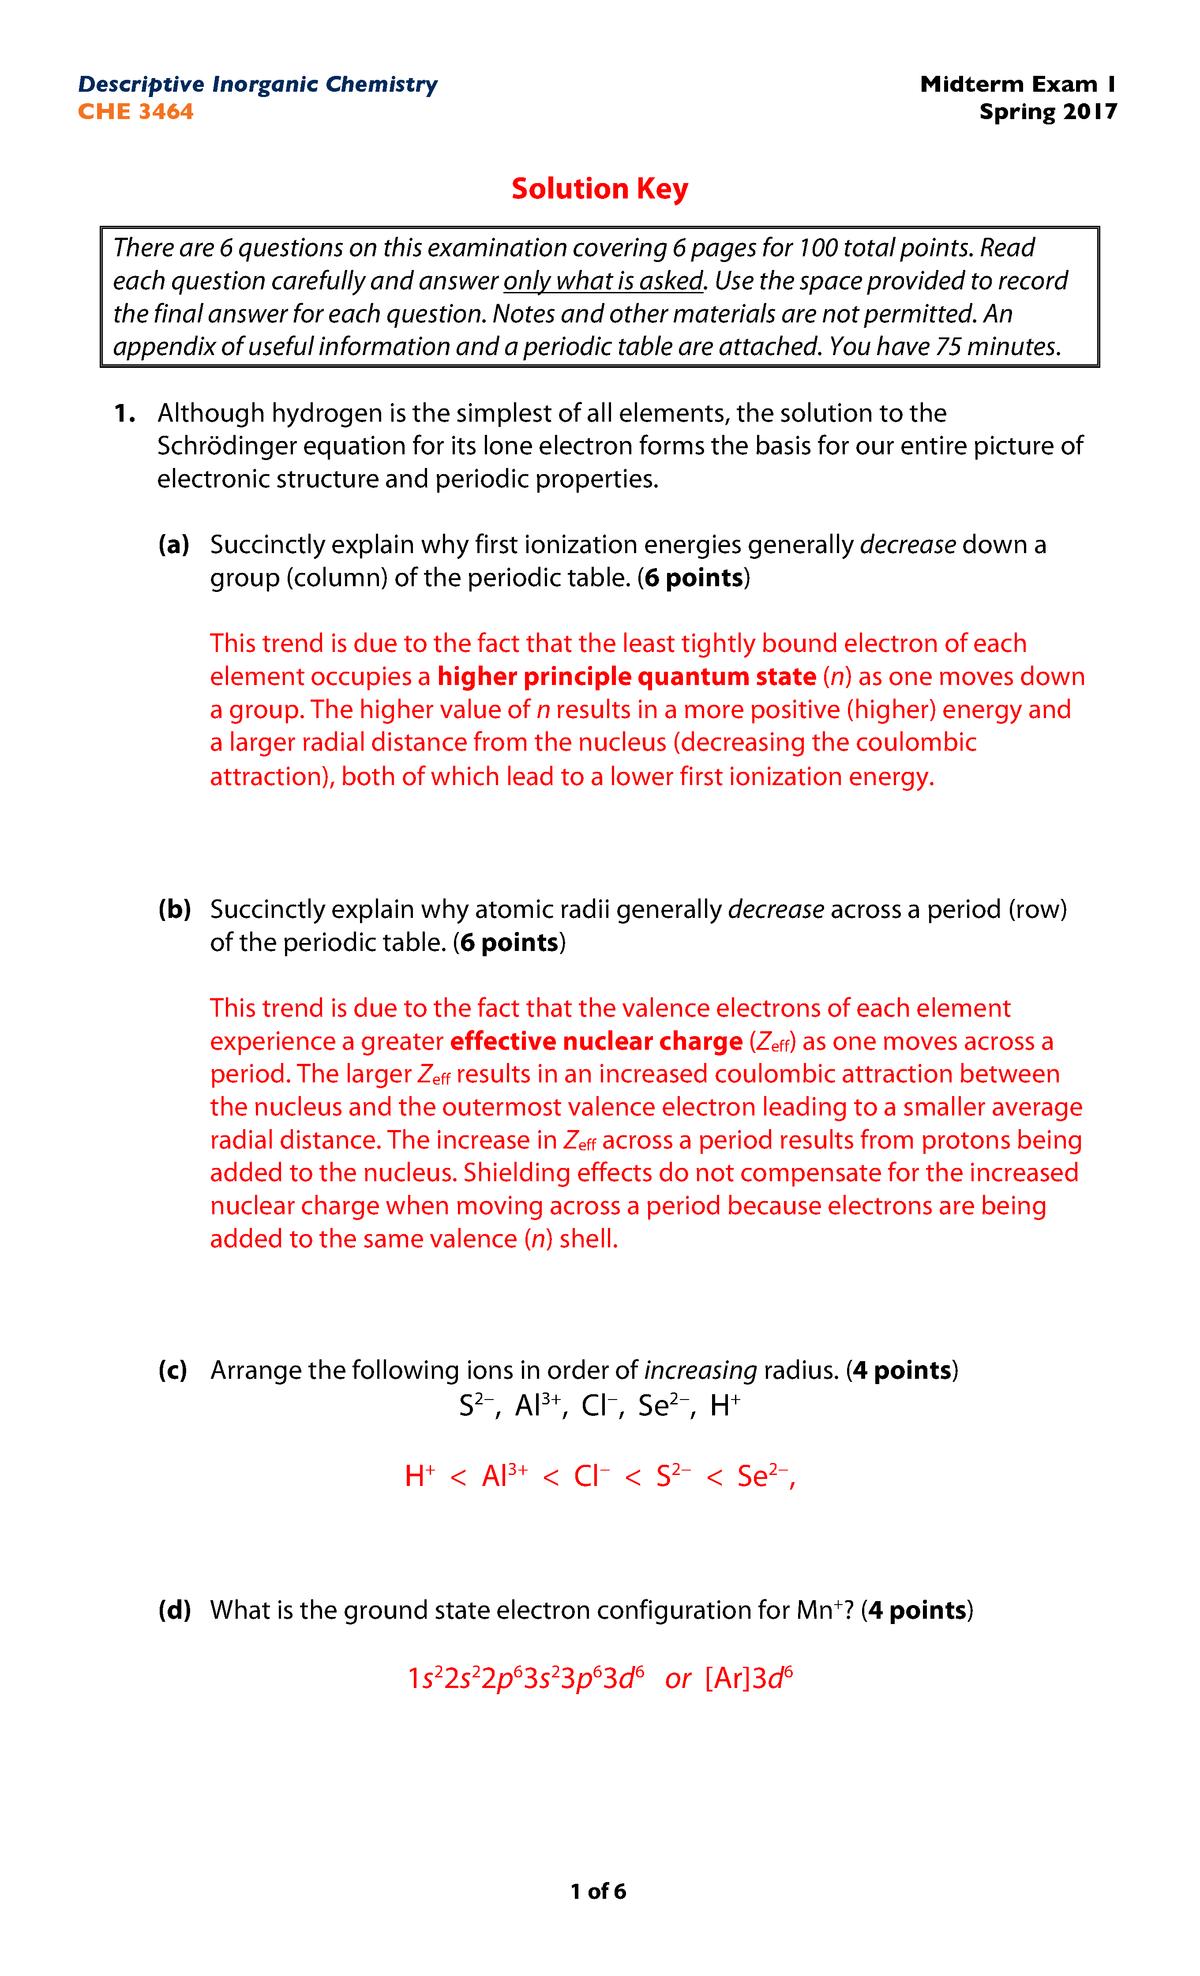 Exam 2015 - CHE 3464: Descriptive Inorganic Chemistry - StuDocu